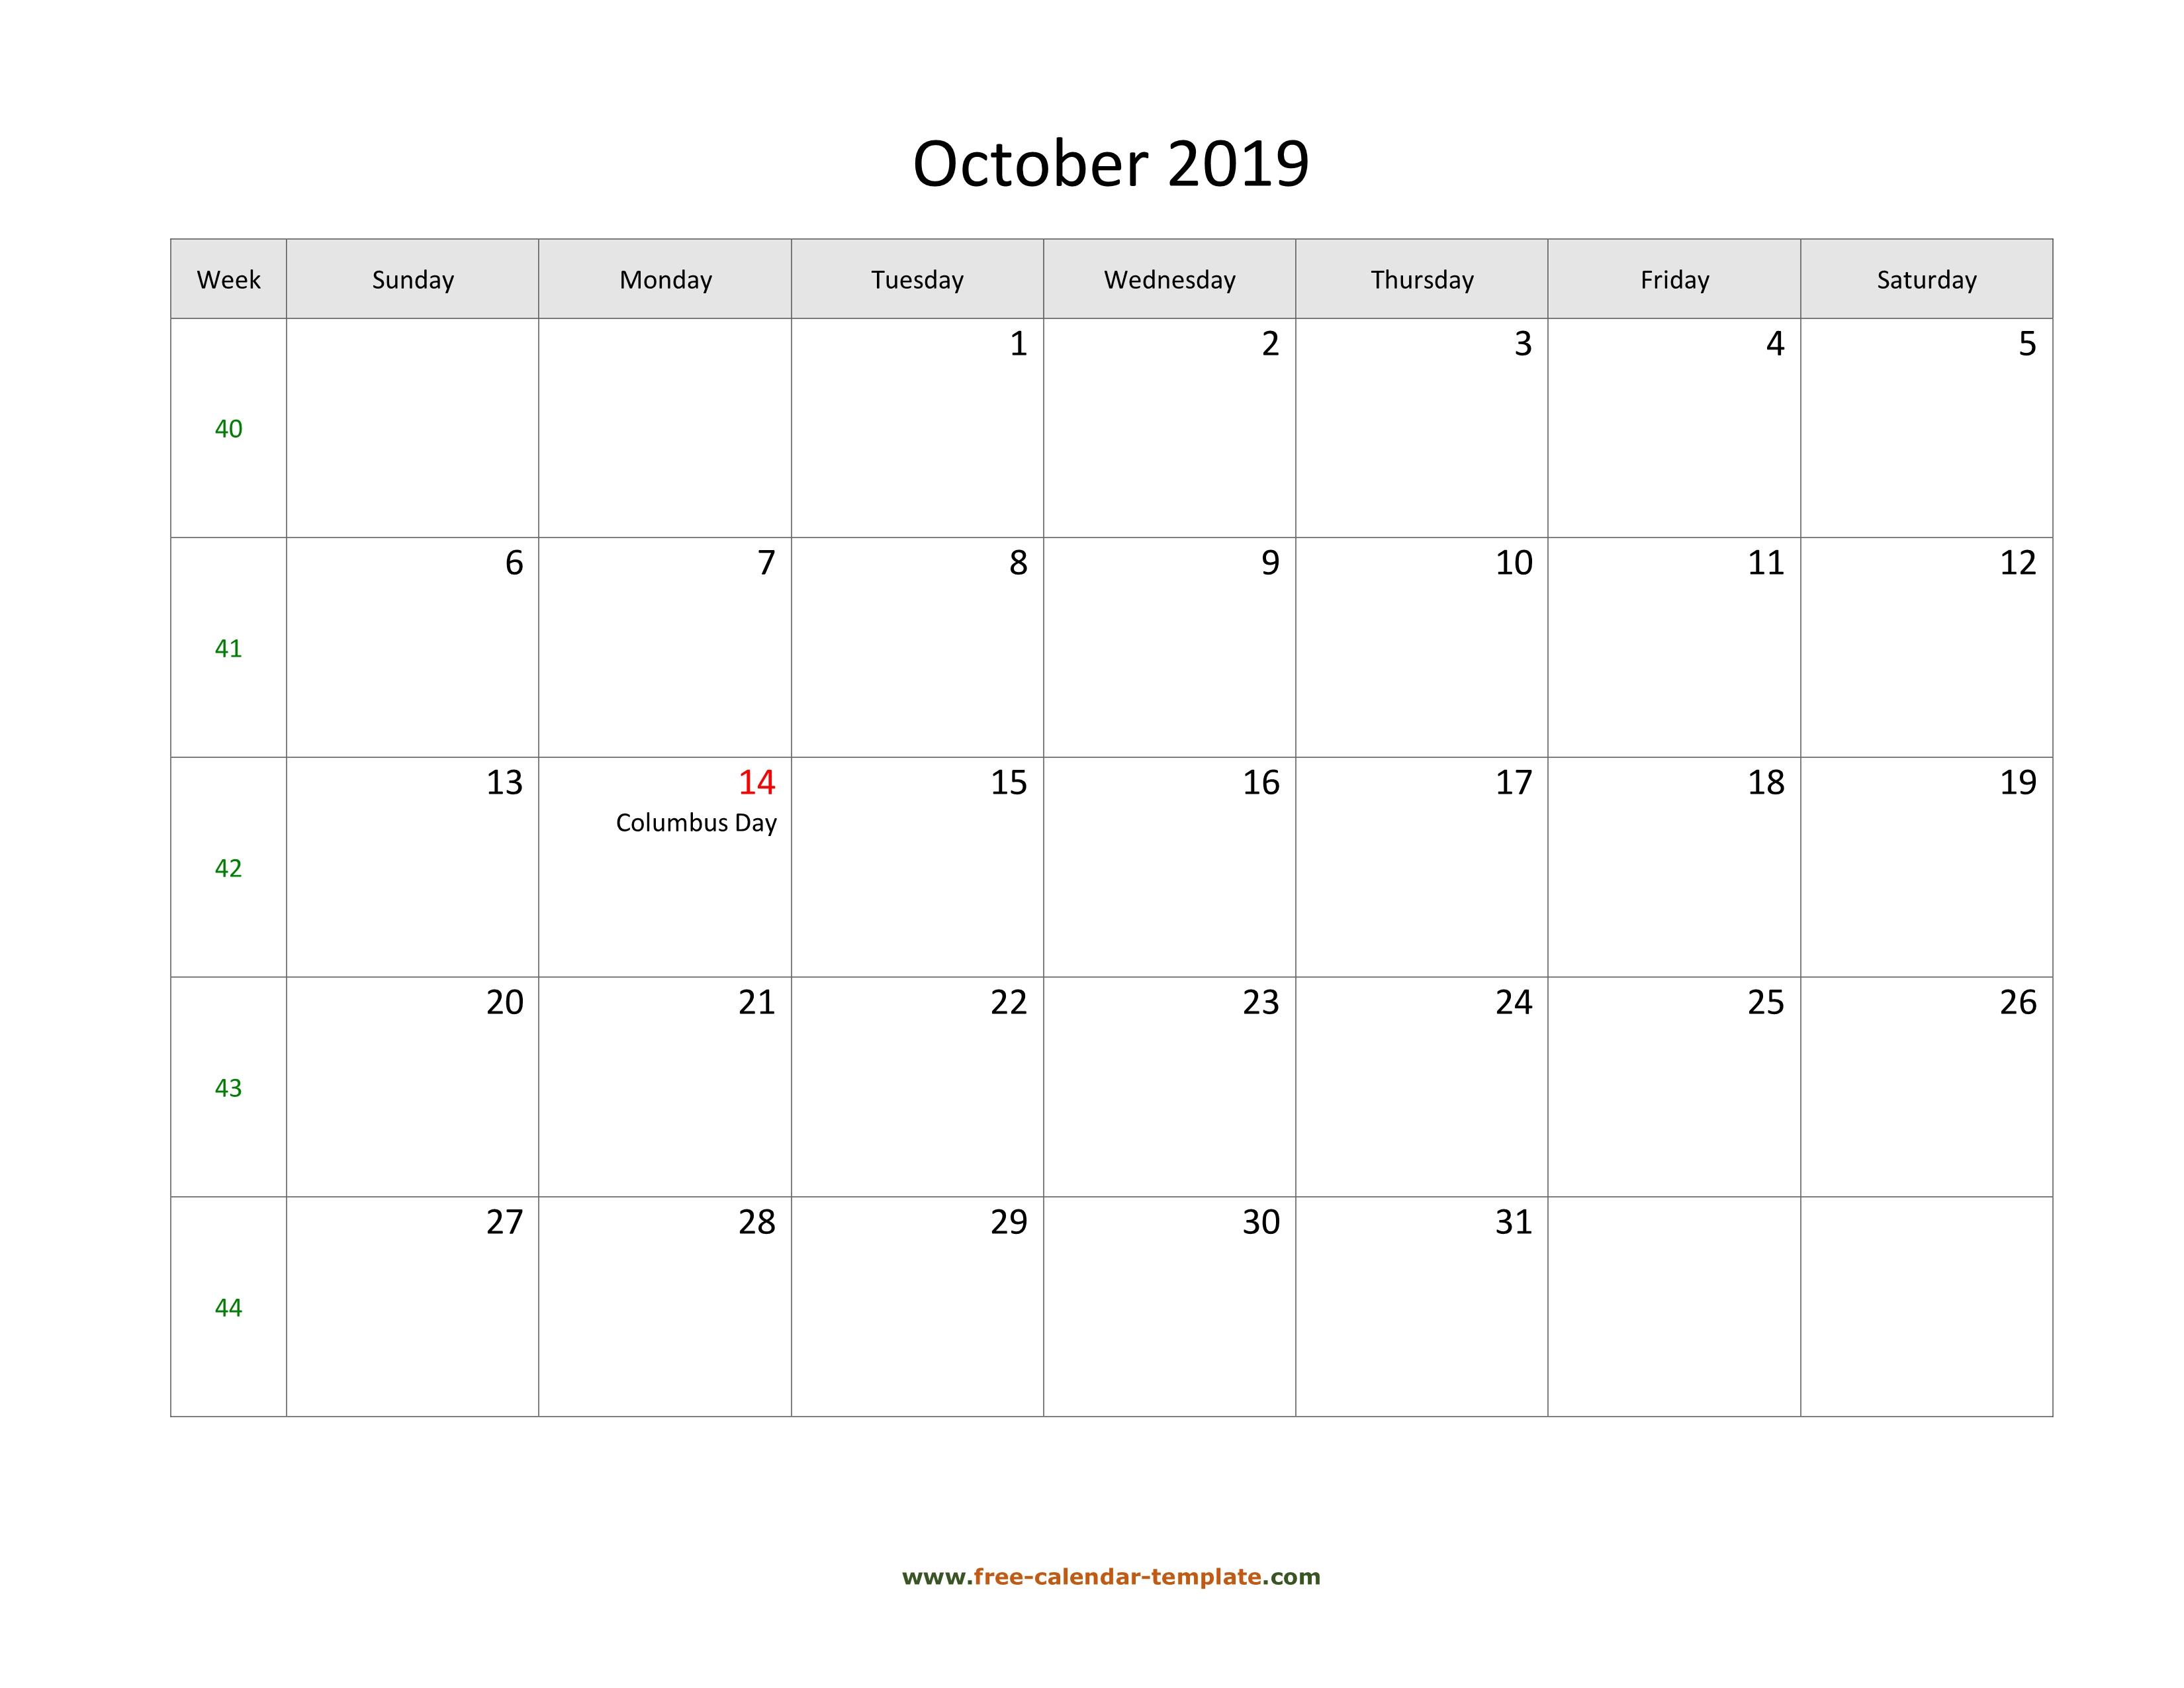 Free 2019 Calendar Blank October Template (Horizontal